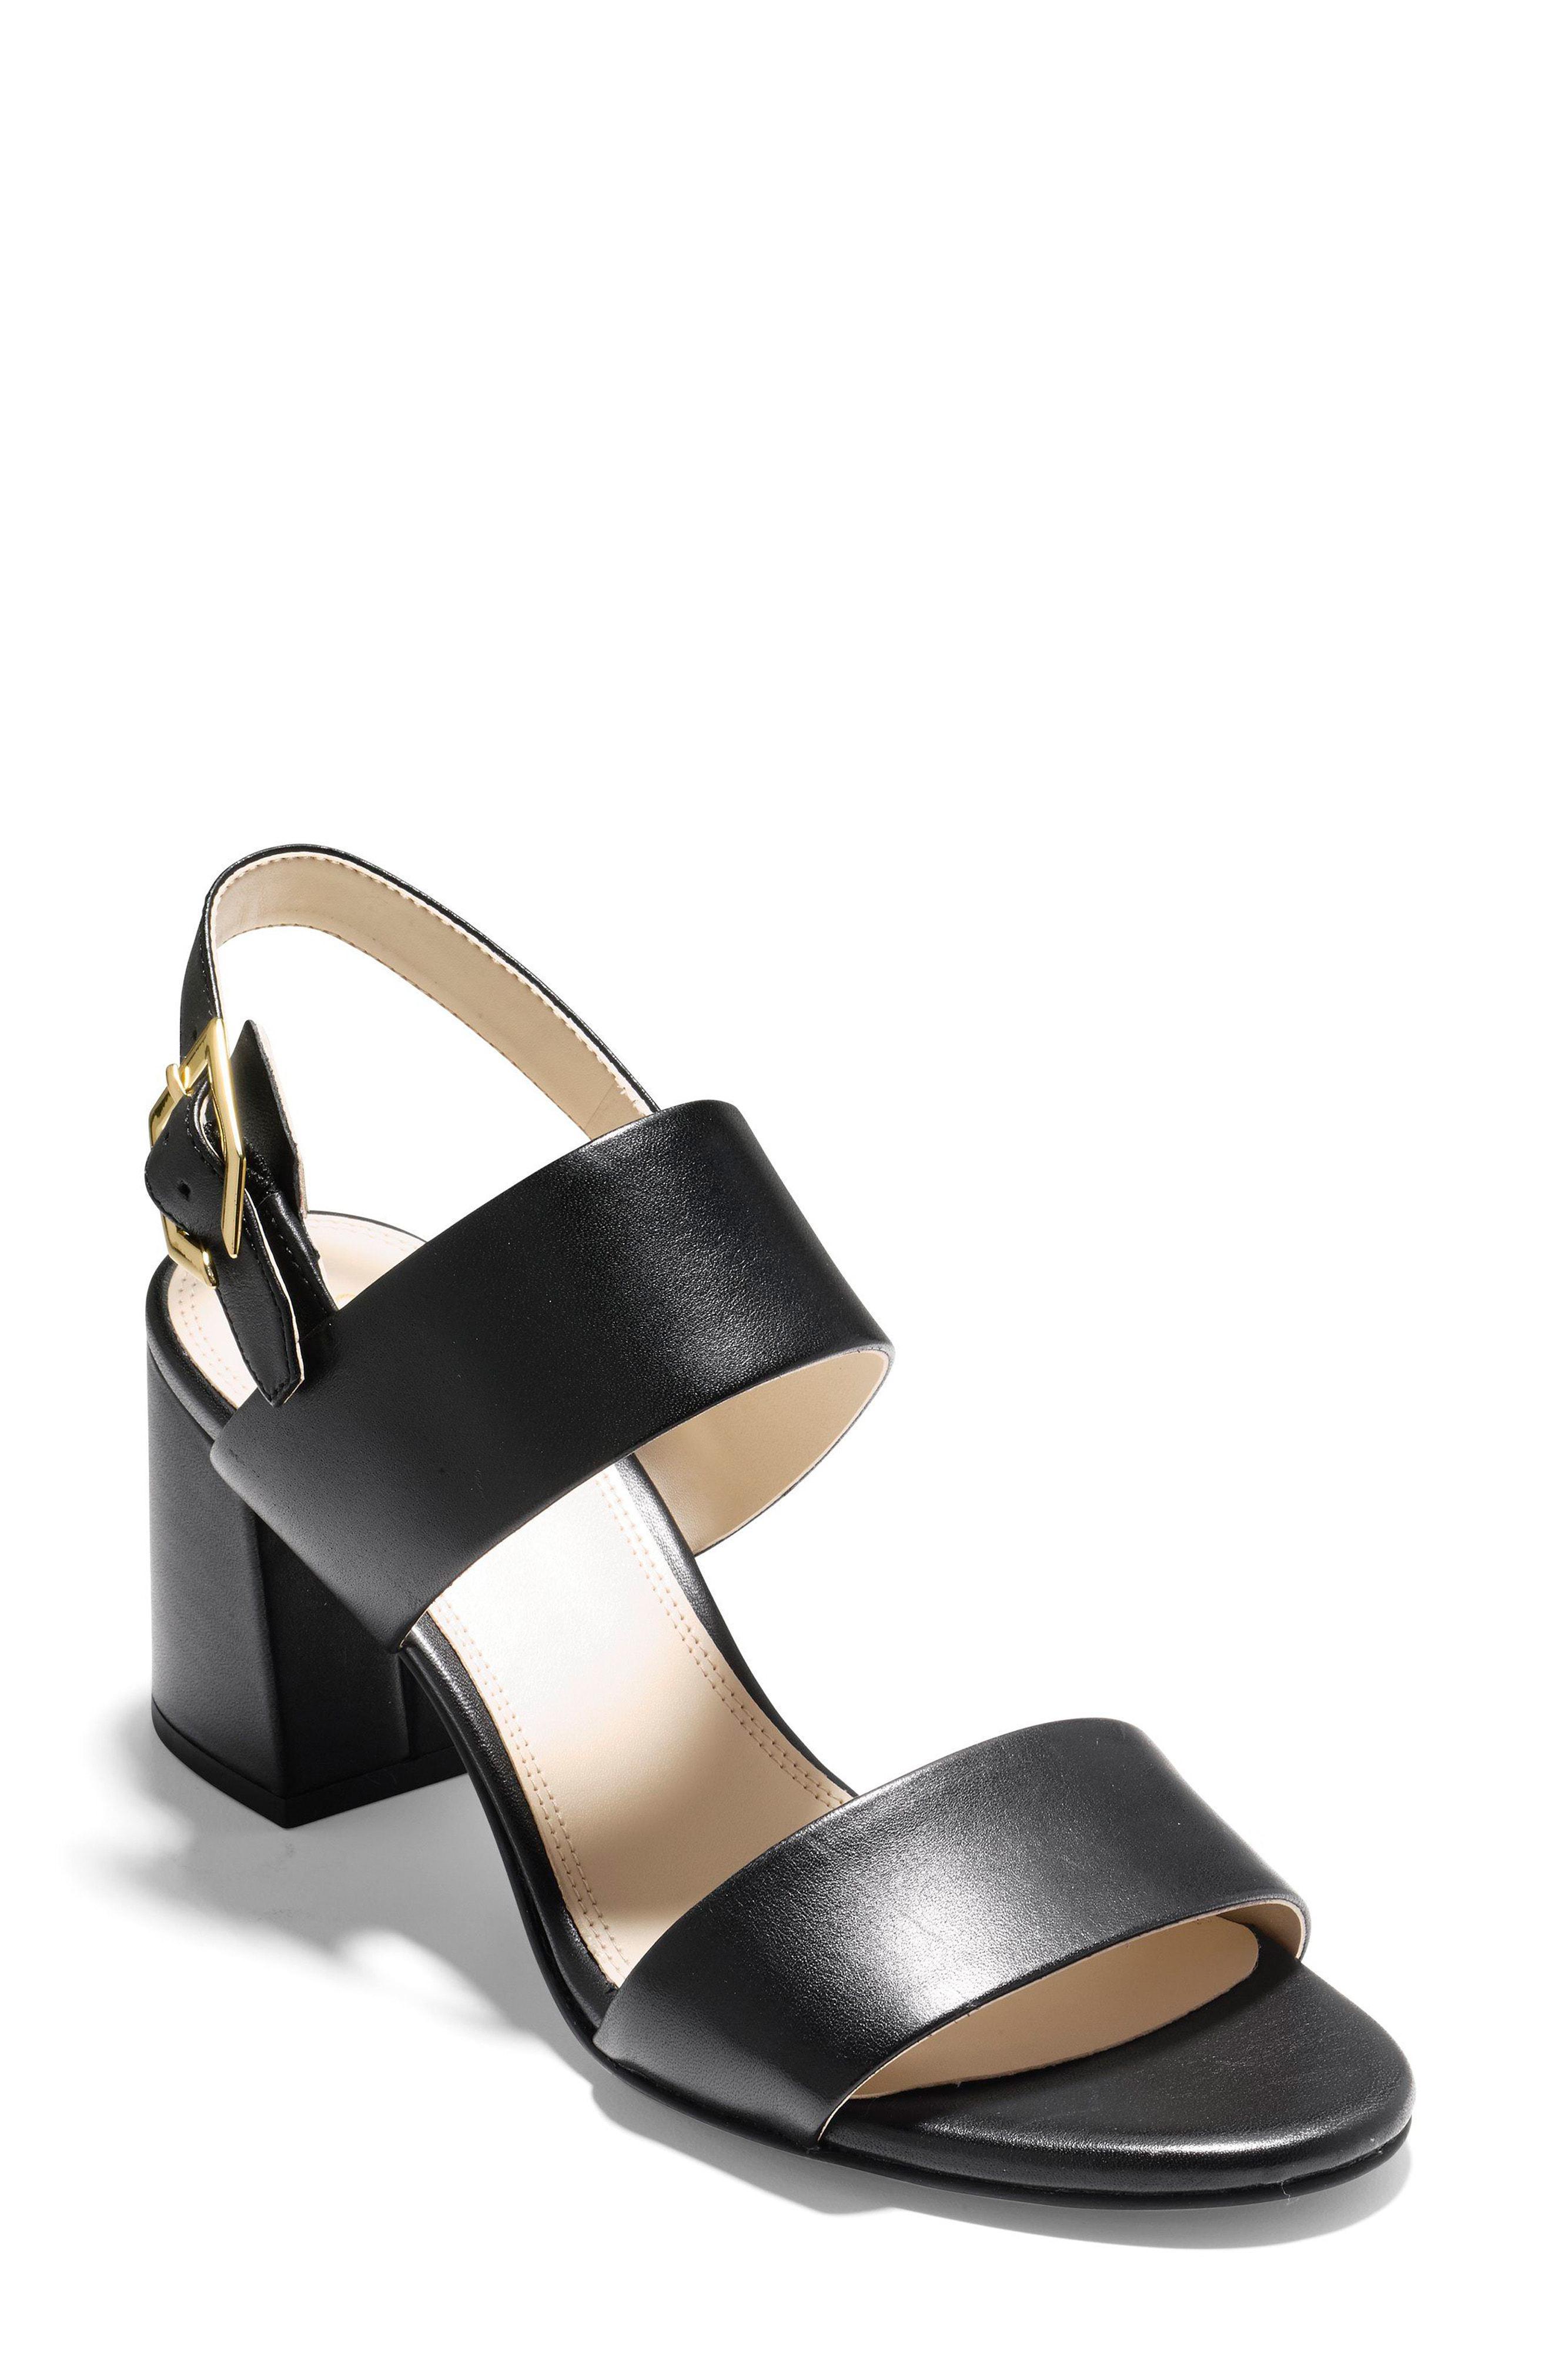 5c6b62e6032 Lyst - Cole Haan Avani Block Heel Sandal in Metallic